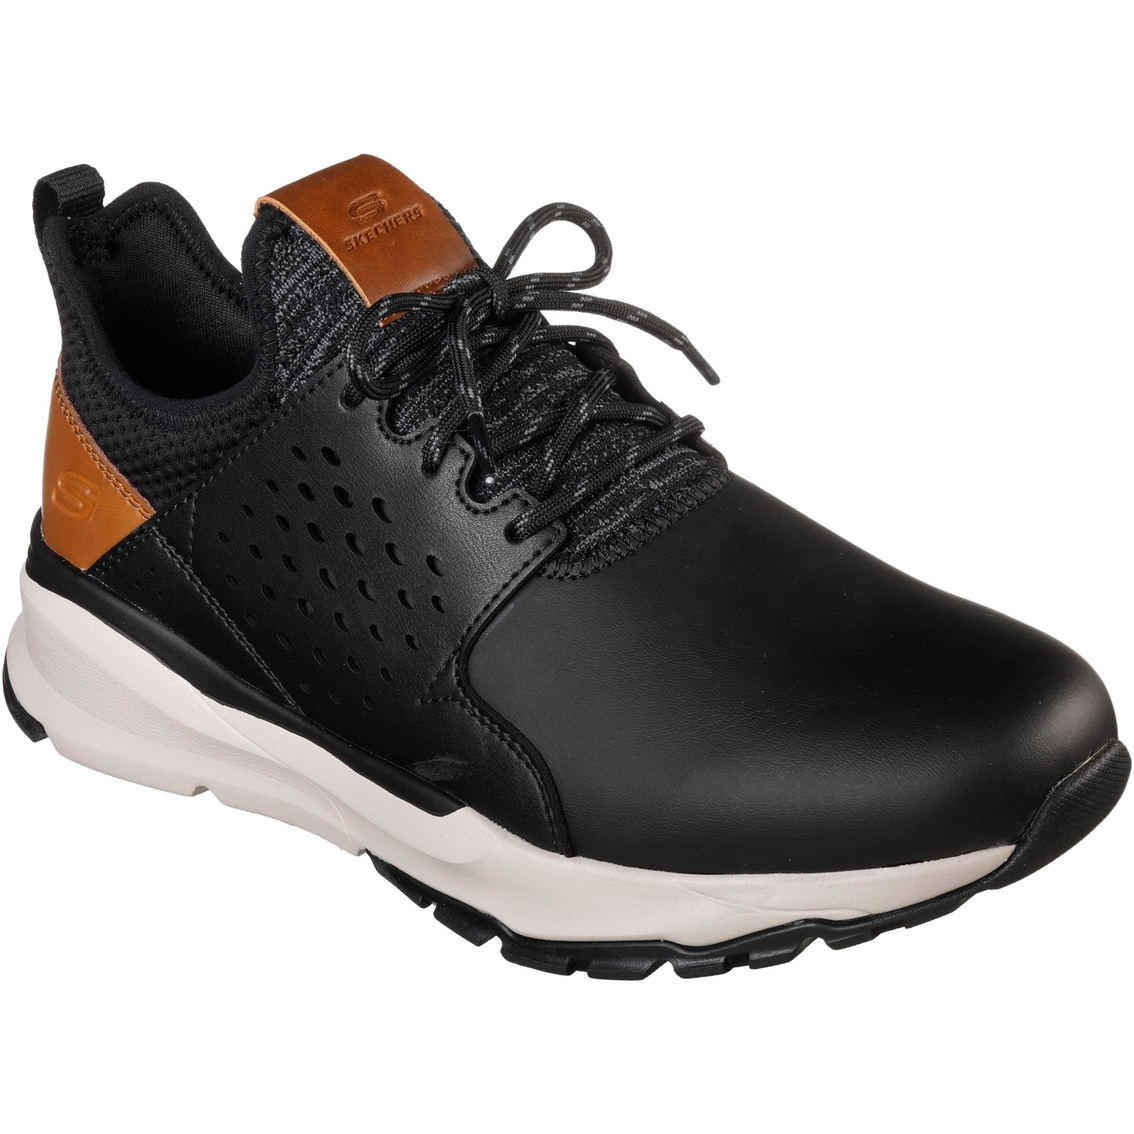 bce12317 Skechers Hemson Streetwear Lace Up Shoes | Casuals | Back To School ...